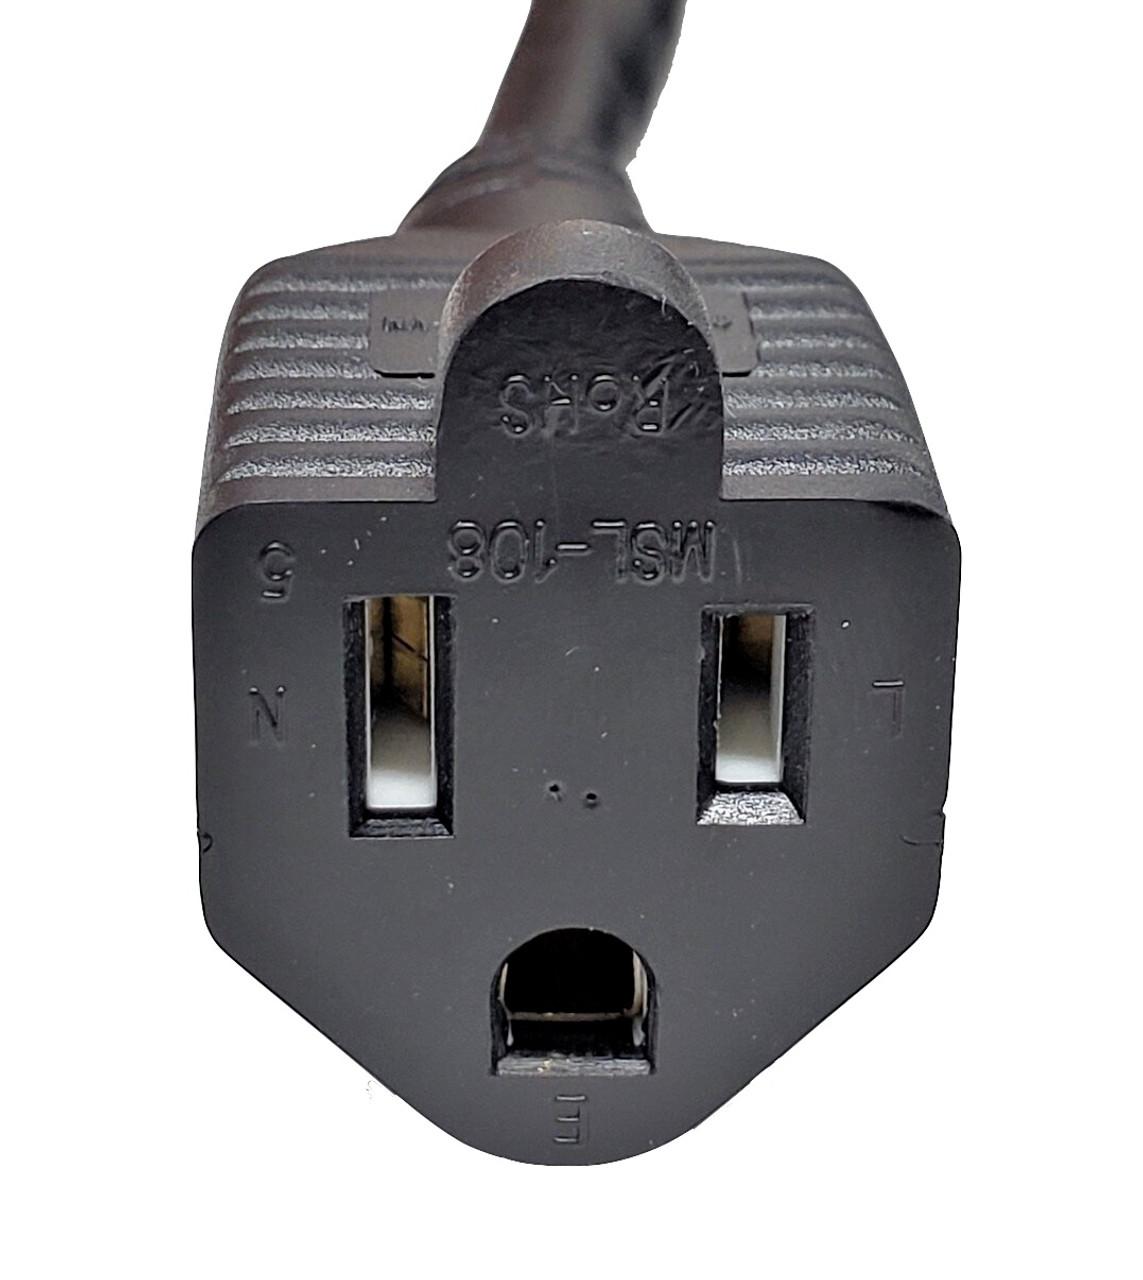 25ft Outdoor Heavy-Duty Power Extension Cable (NEMA 5-15P to NEMA 5-15R)